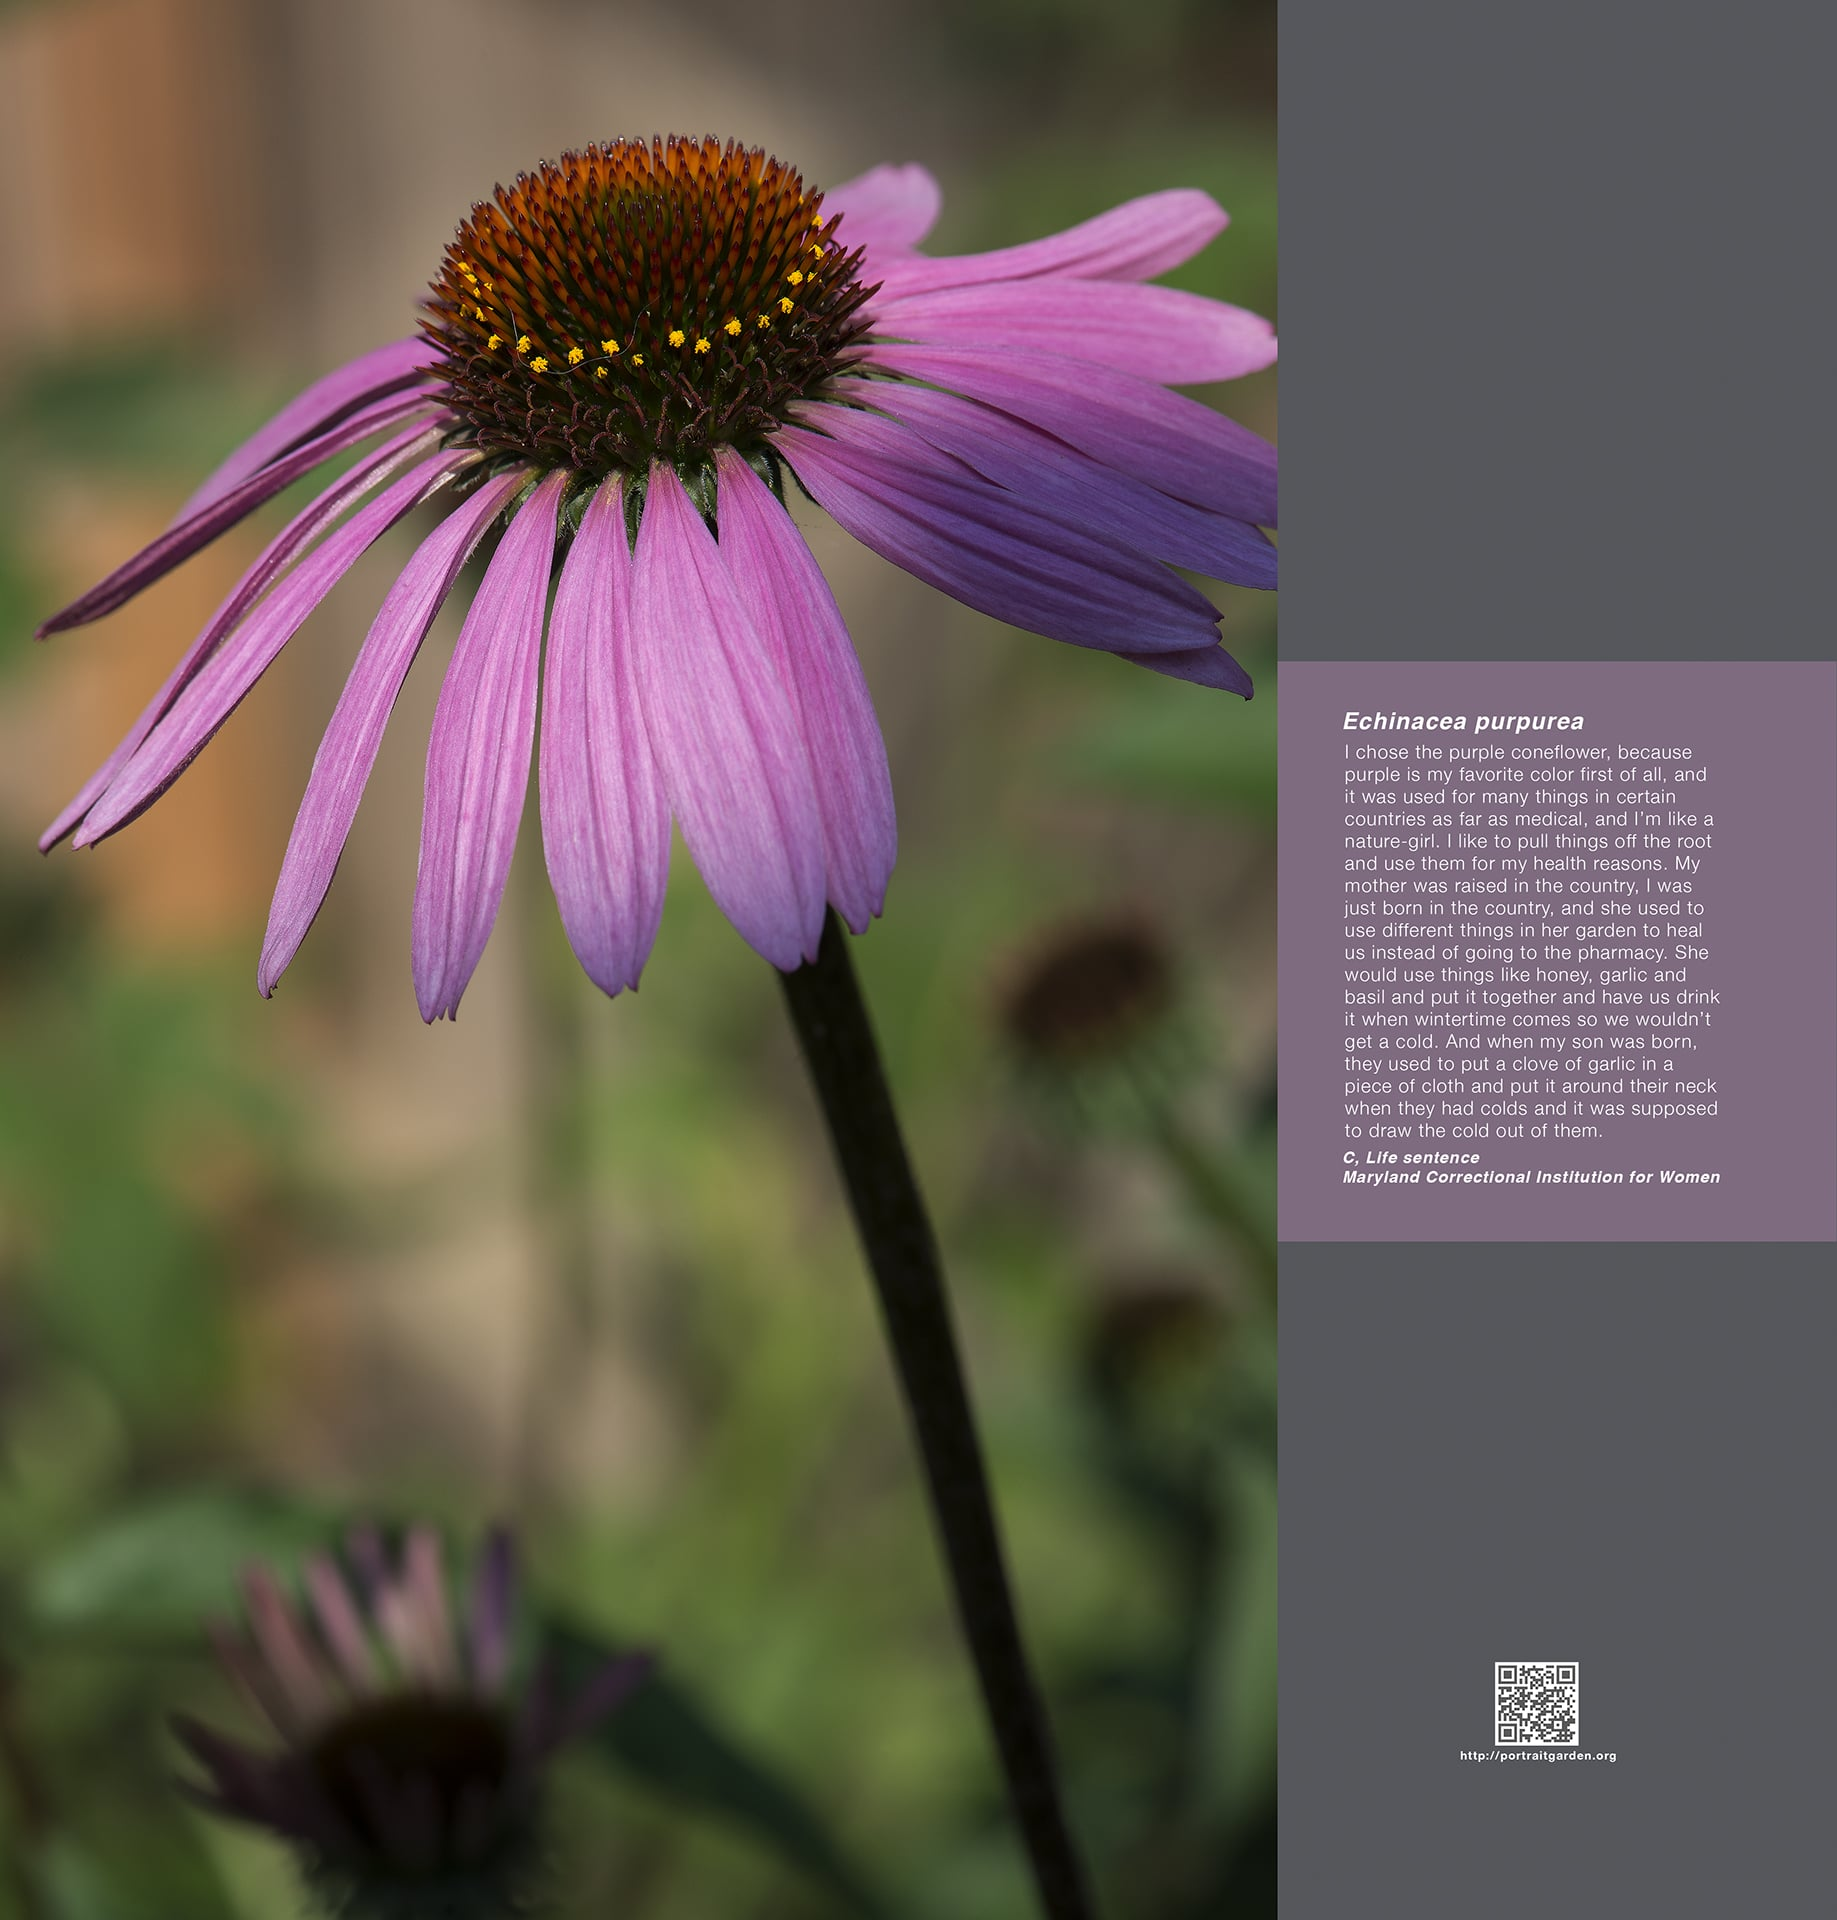 Portrait Garden (C, Enchinacea purpurea)